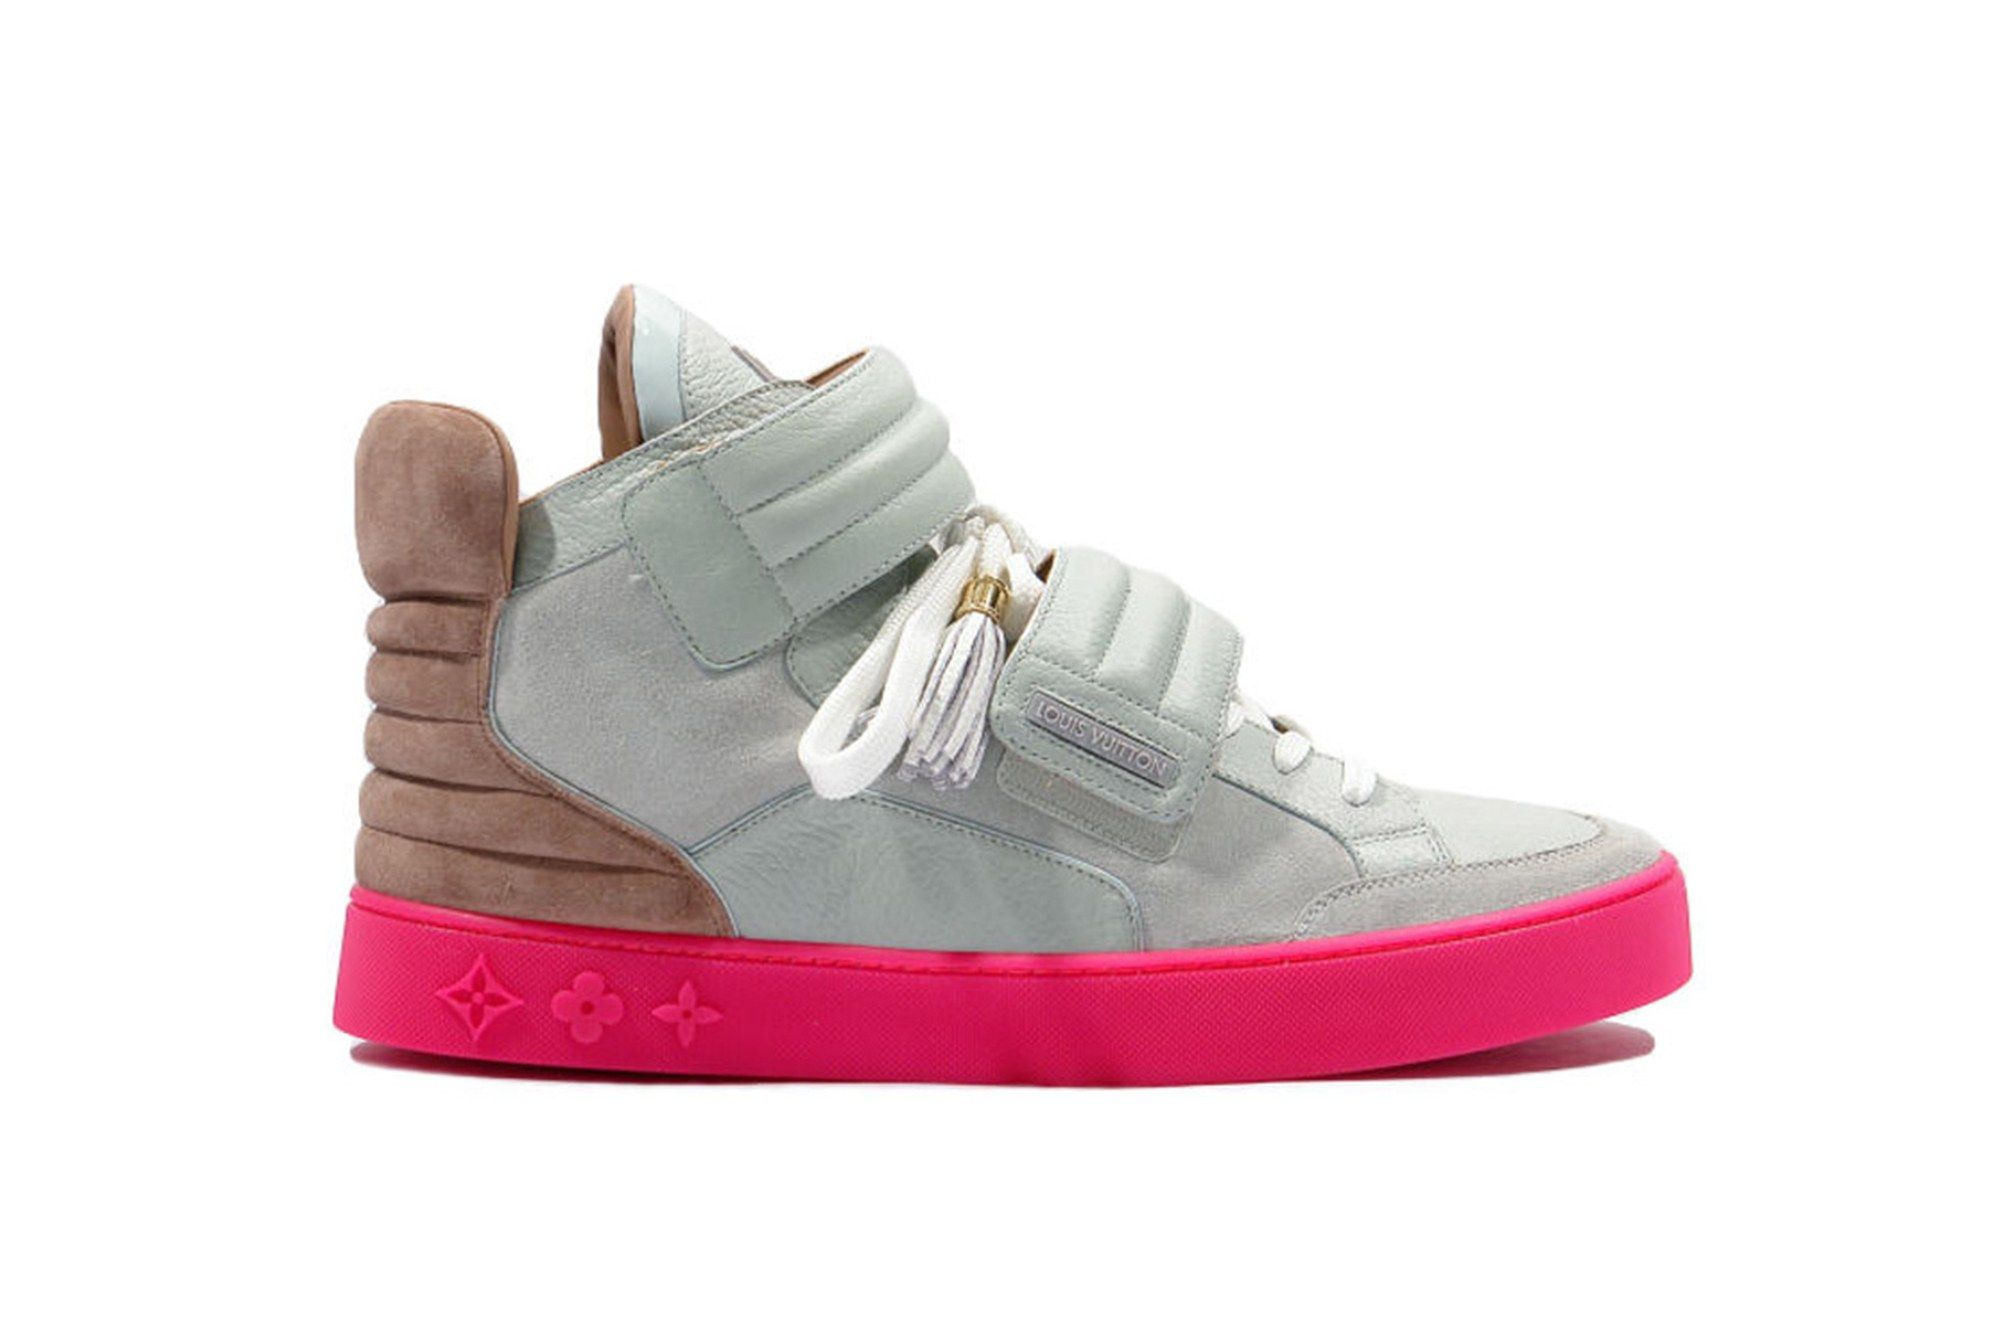 bf5796ed5391 Kanye West x Louis Vuitton Jasper